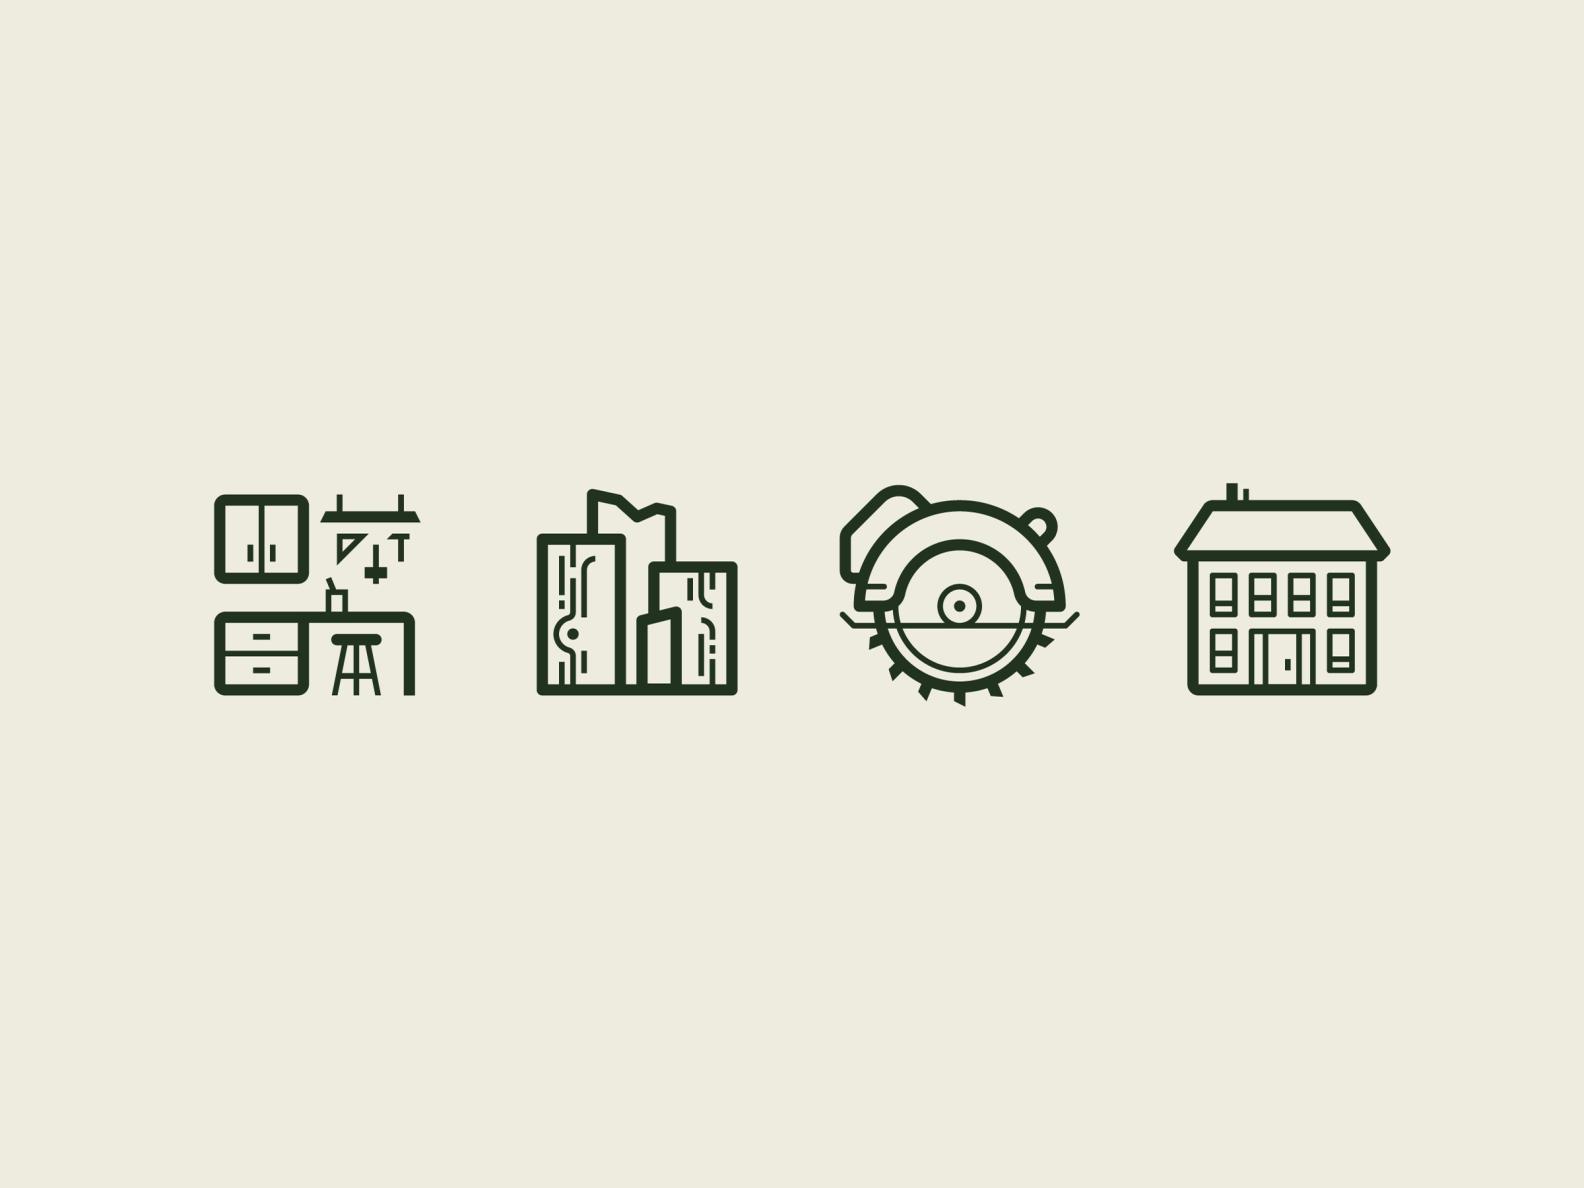 Elm Street Shop Icons — 2 𝑜𝑓 2